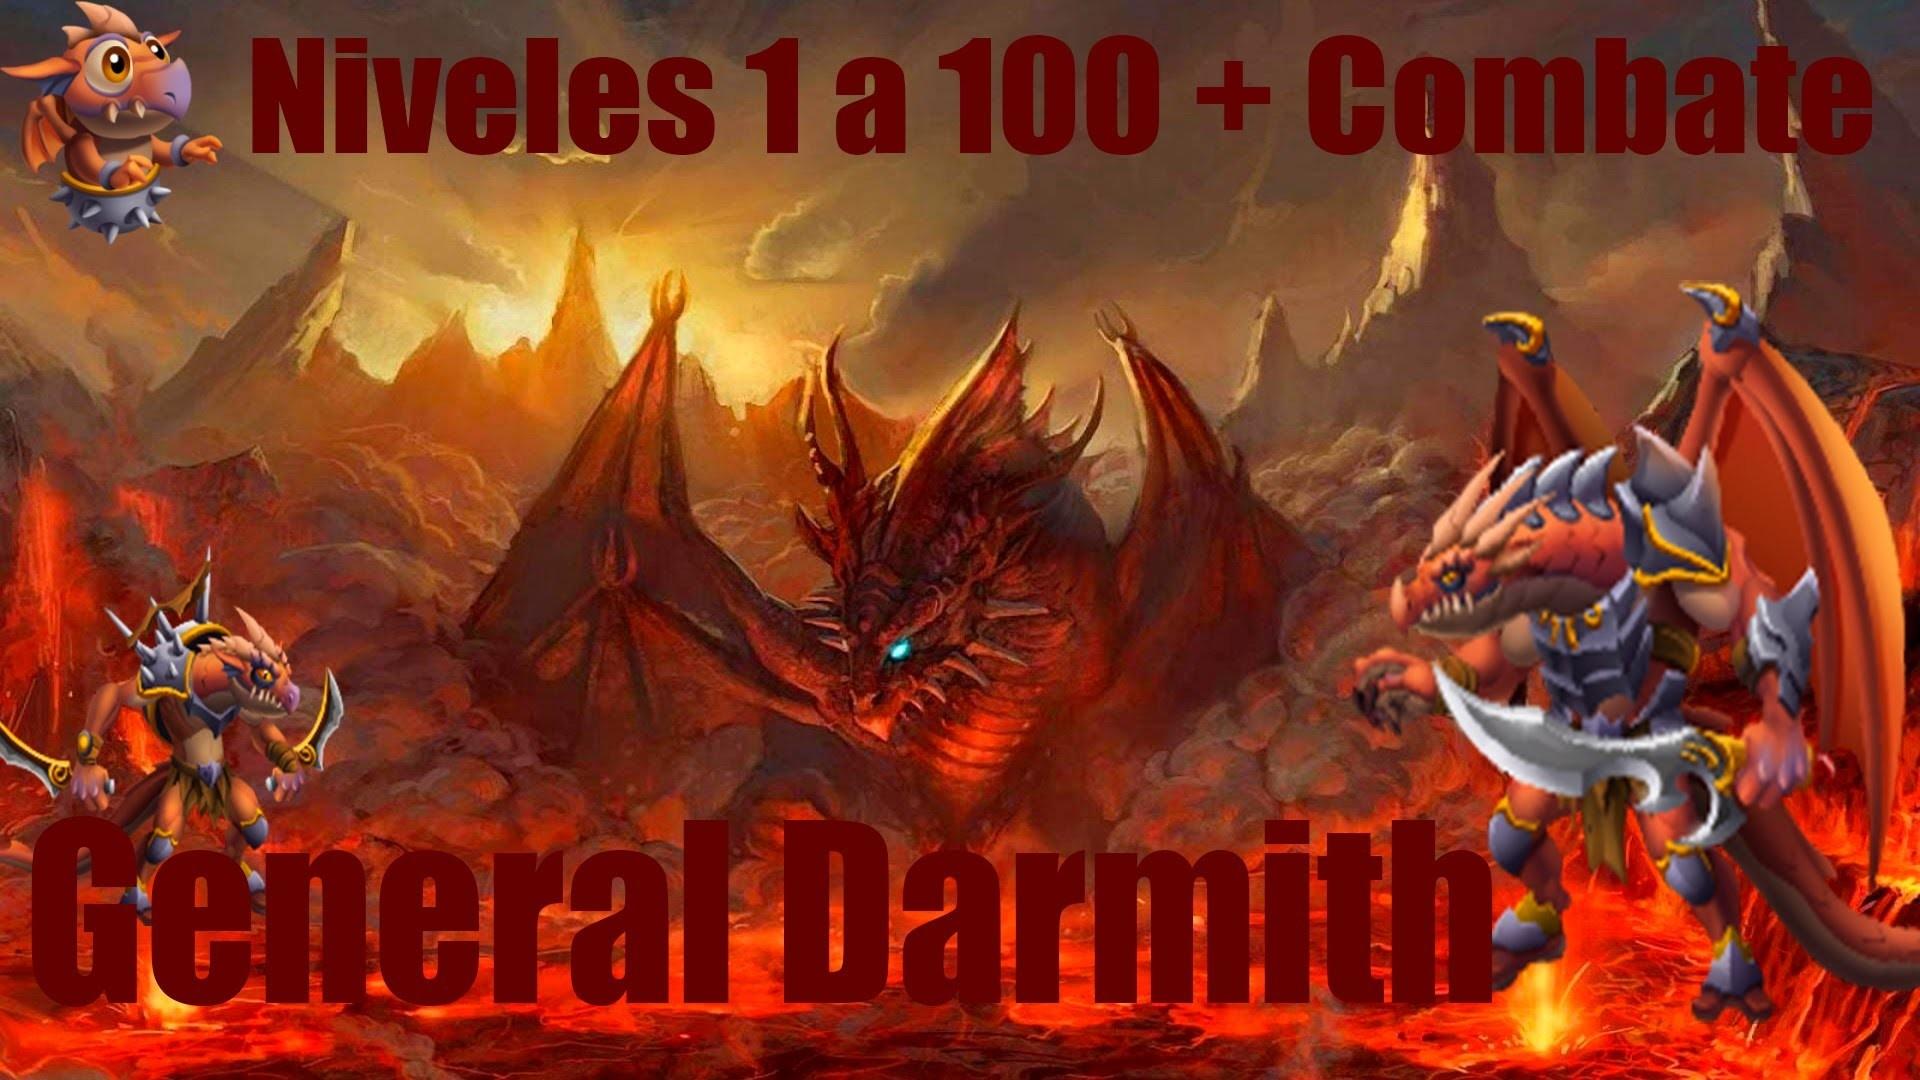 General Darmith 1 al 100 + Combate | Monster Legends